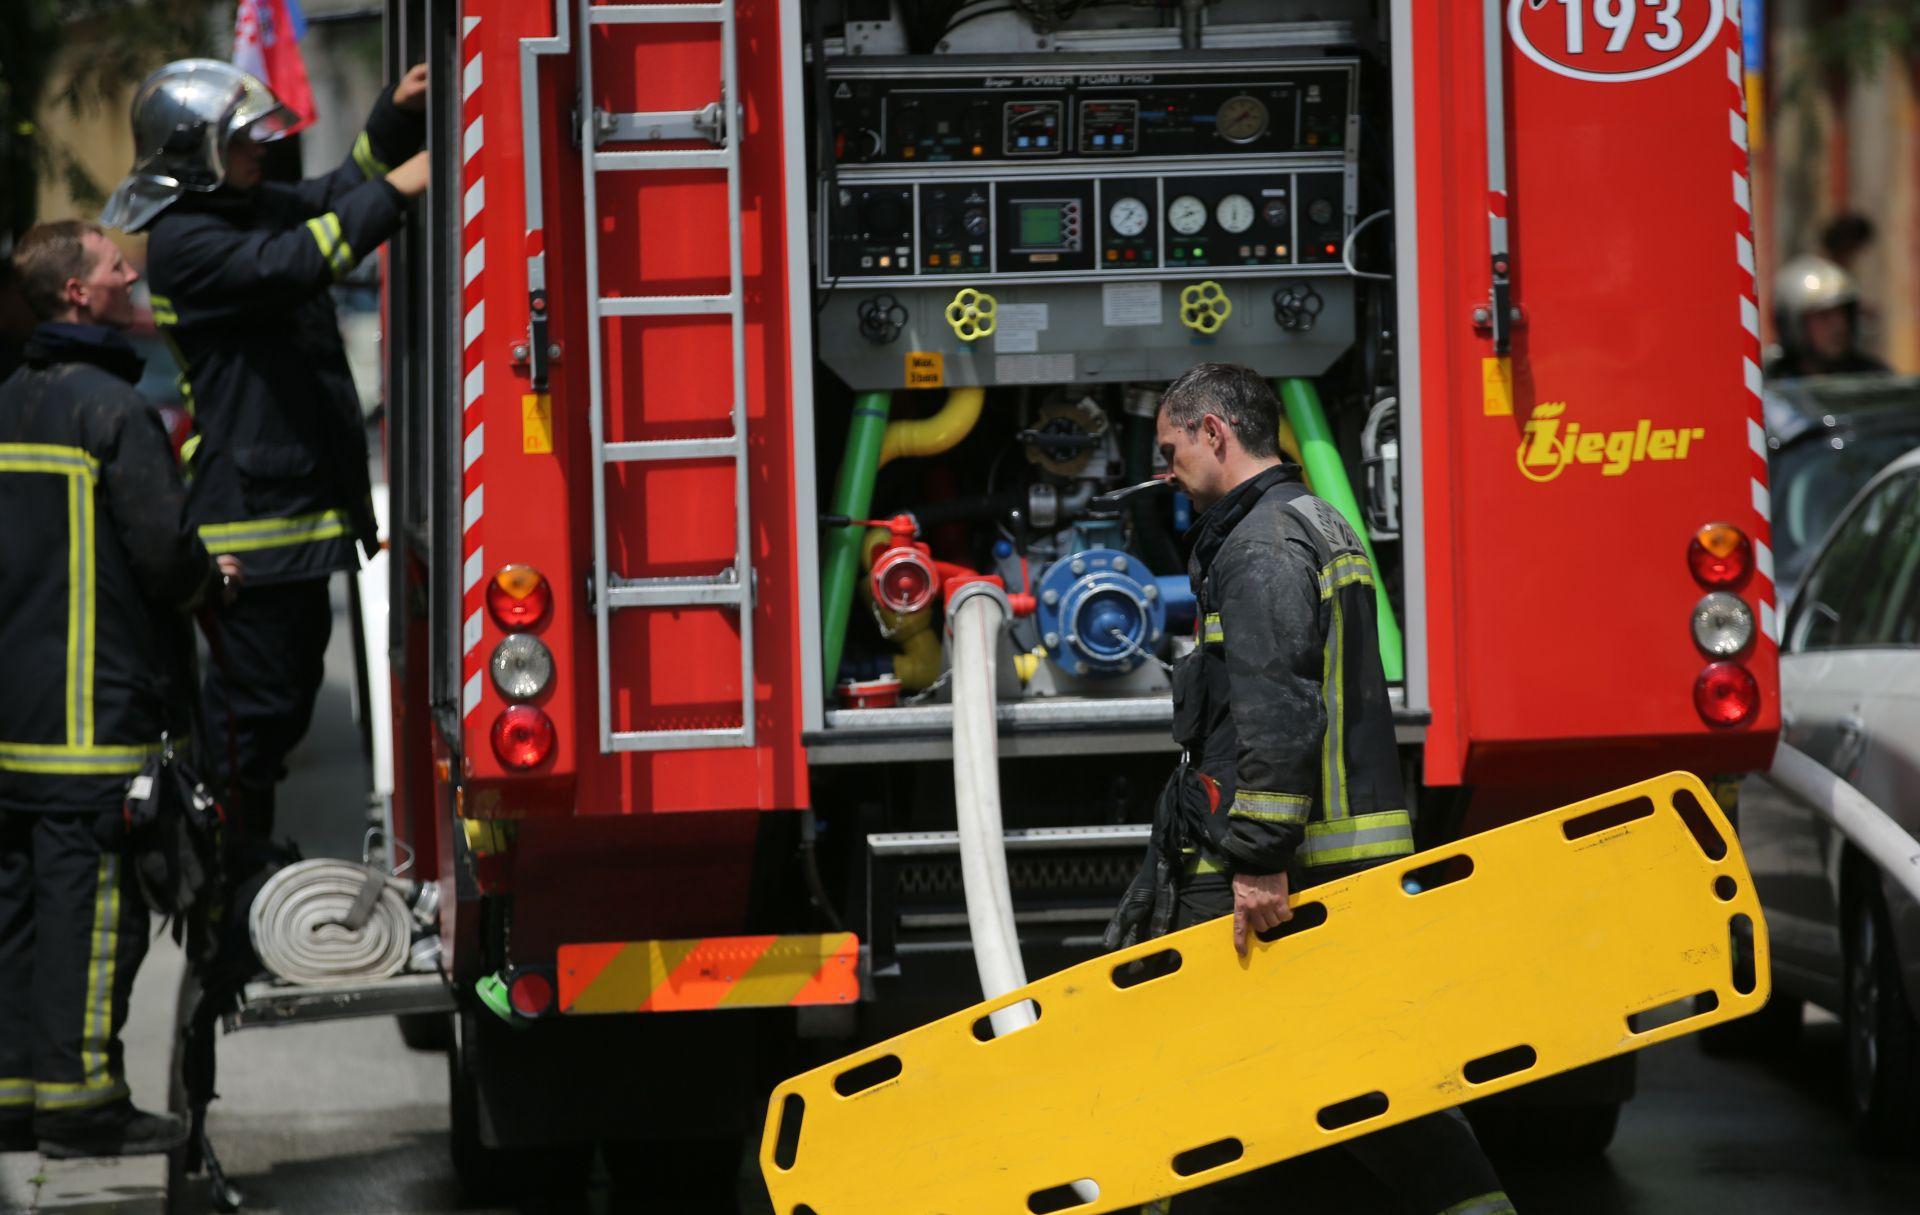 OČEVID U LOPAČI Isključen tehnički uzrok požara